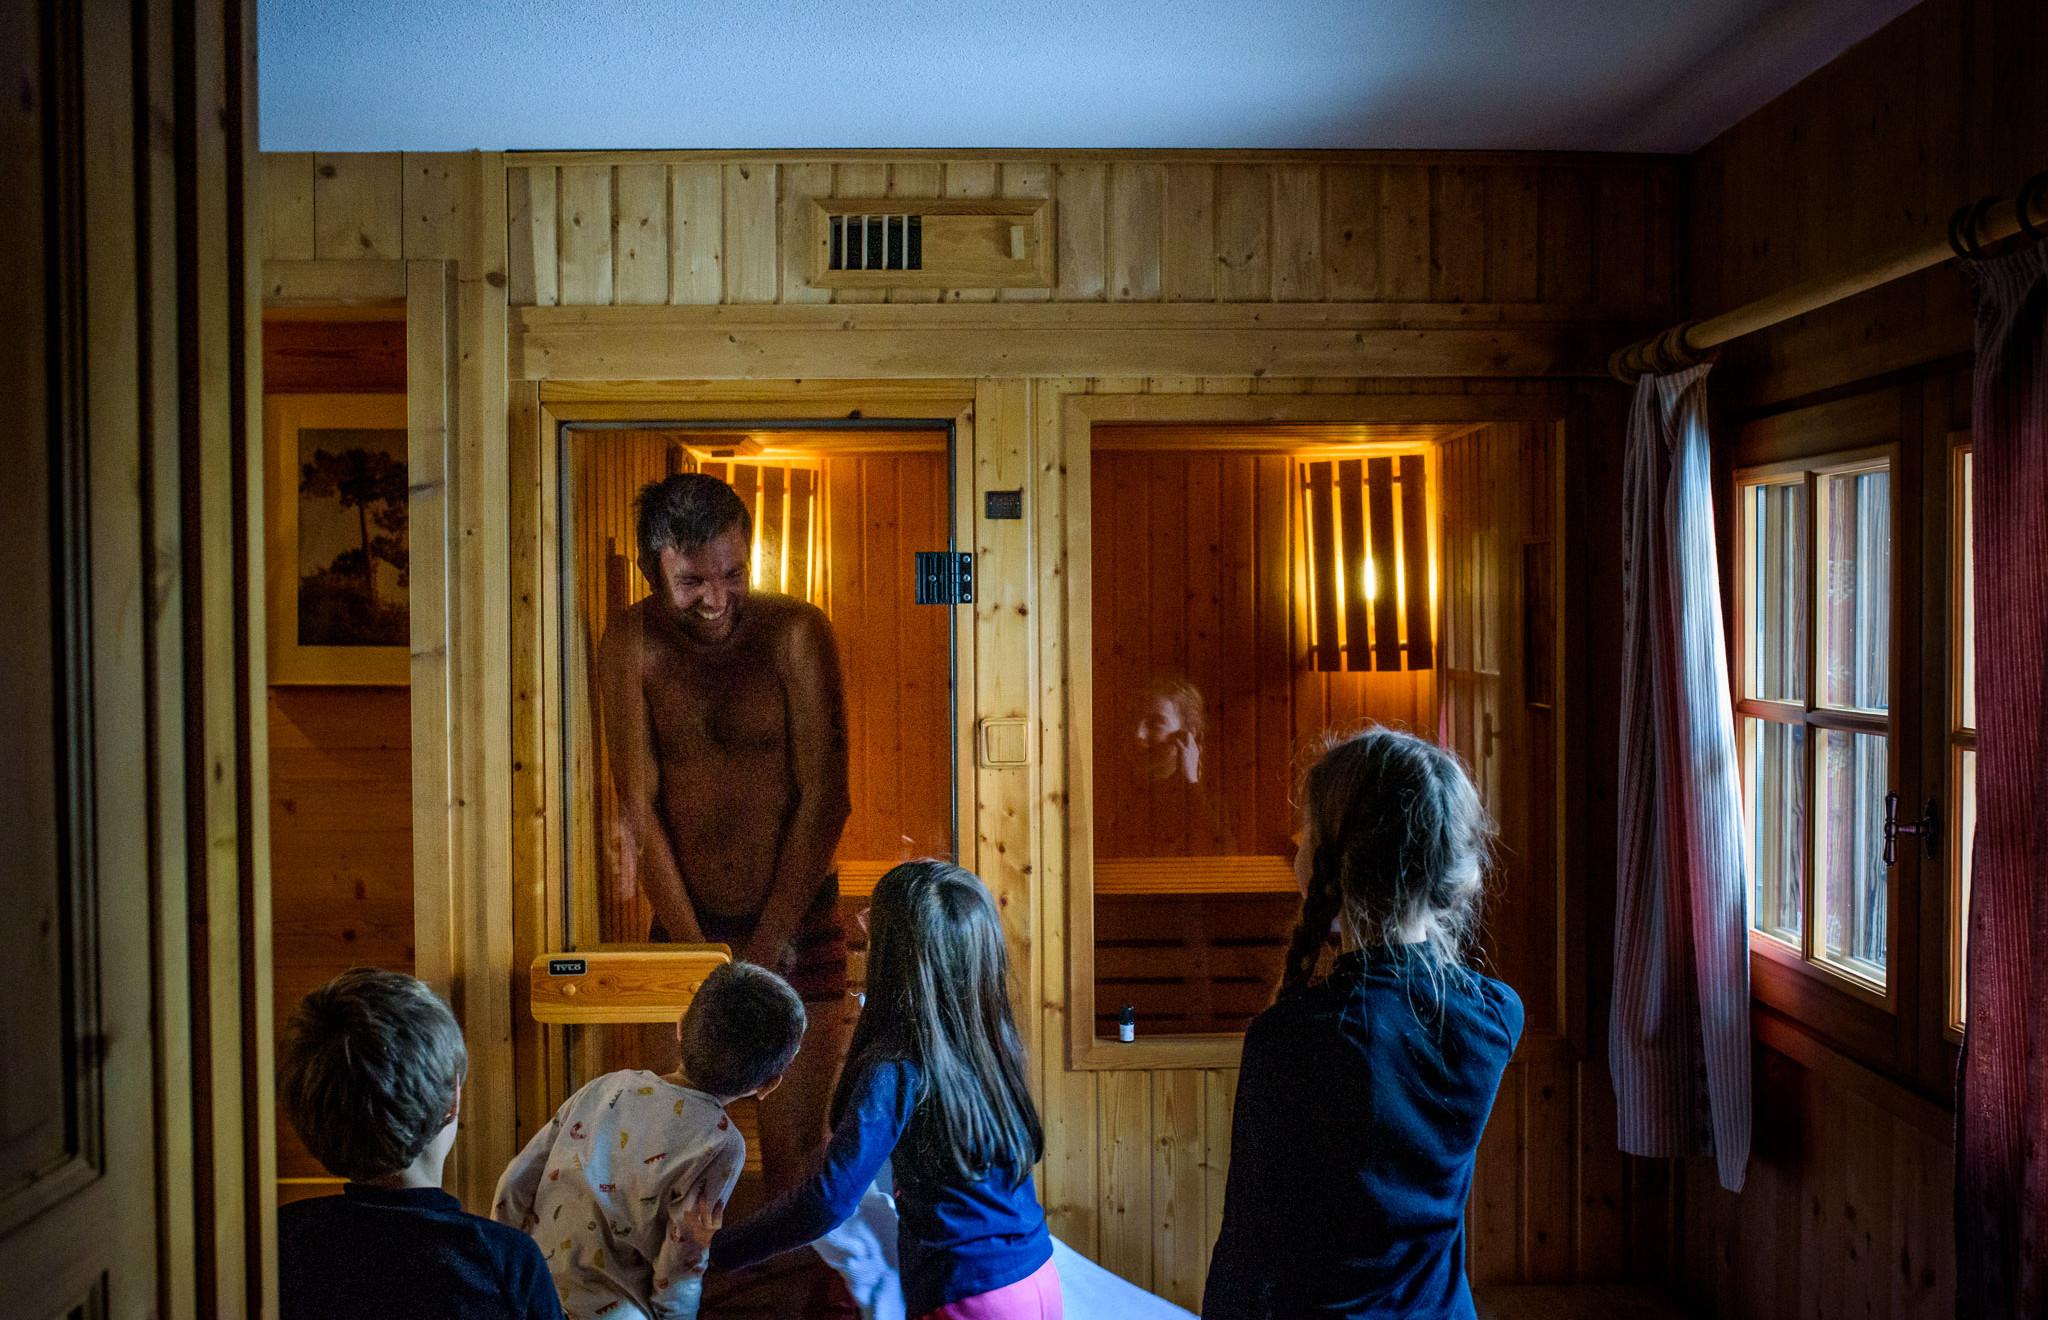 little kids peek on their uncle in the sauna in his underwear